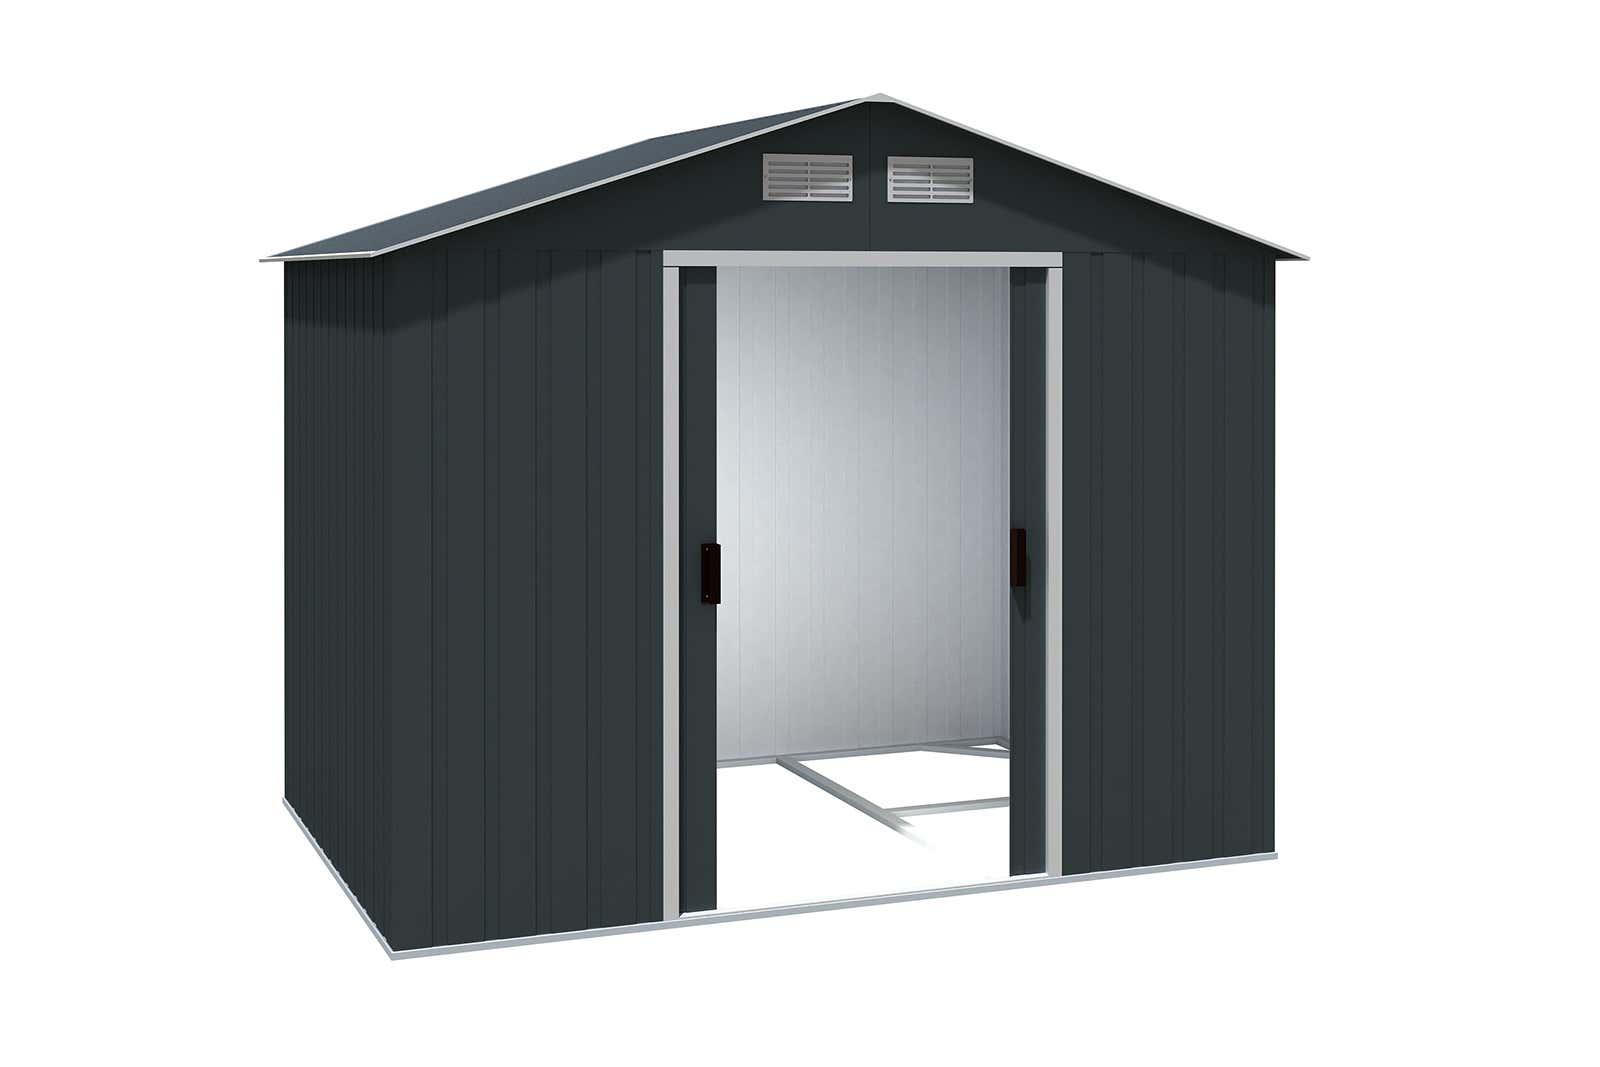 metallger tehaus titan 8x6 anthrazit 7243 a z gartenhaus gmbh. Black Bedroom Furniture Sets. Home Design Ideas